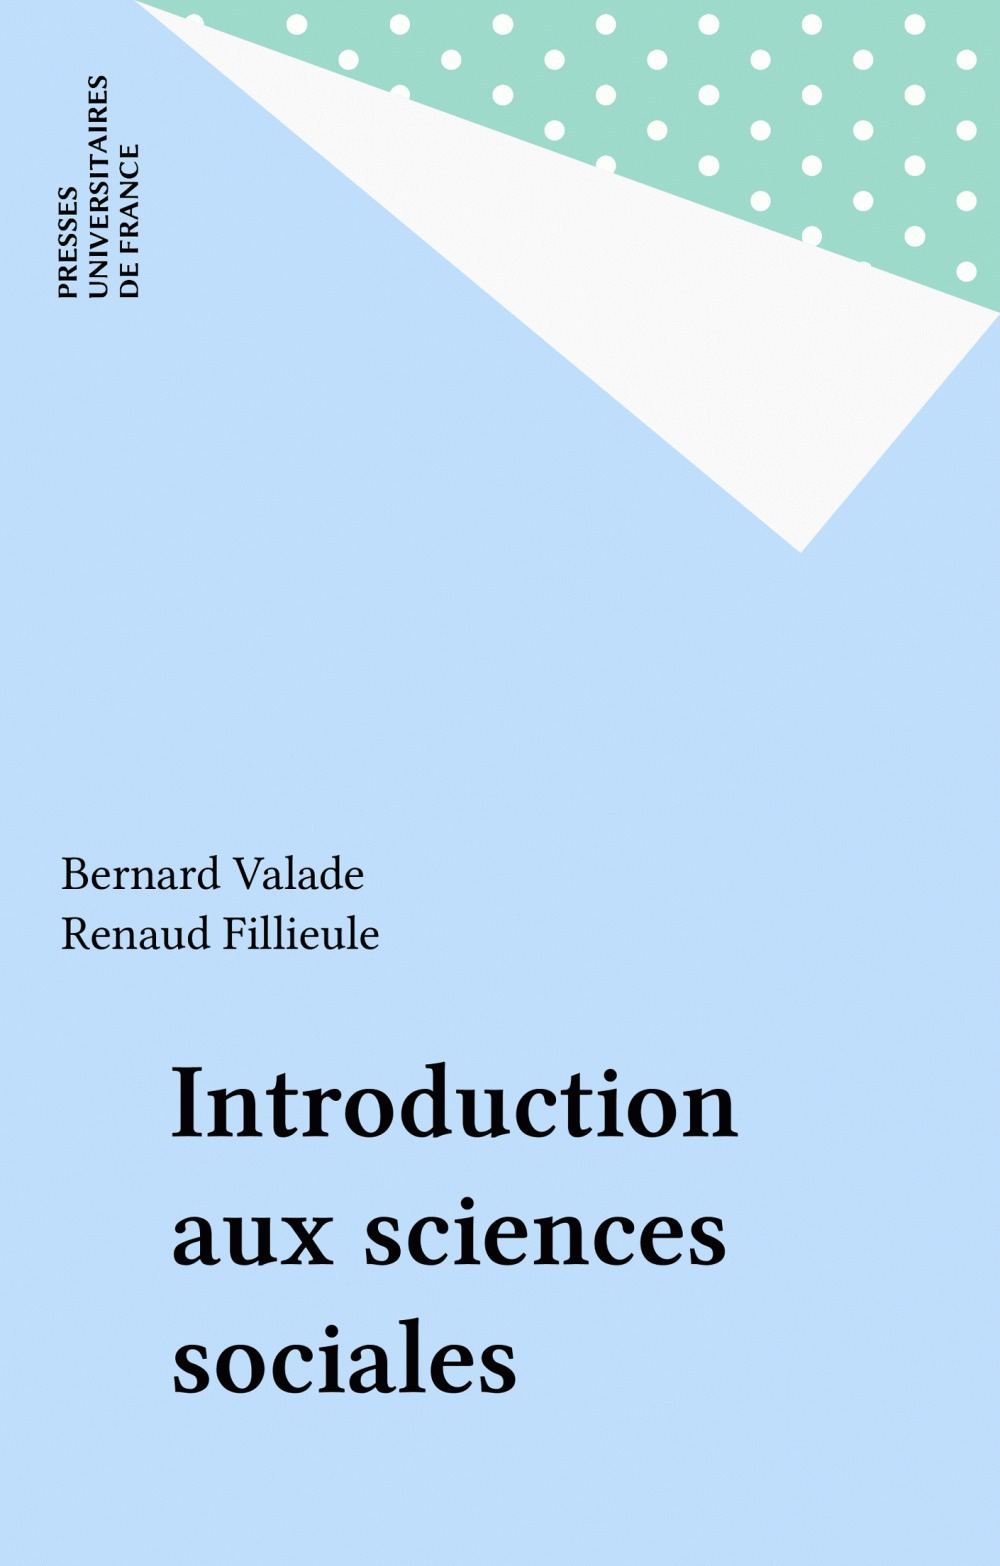 Bernard Valade Introduction aux sciences sociales